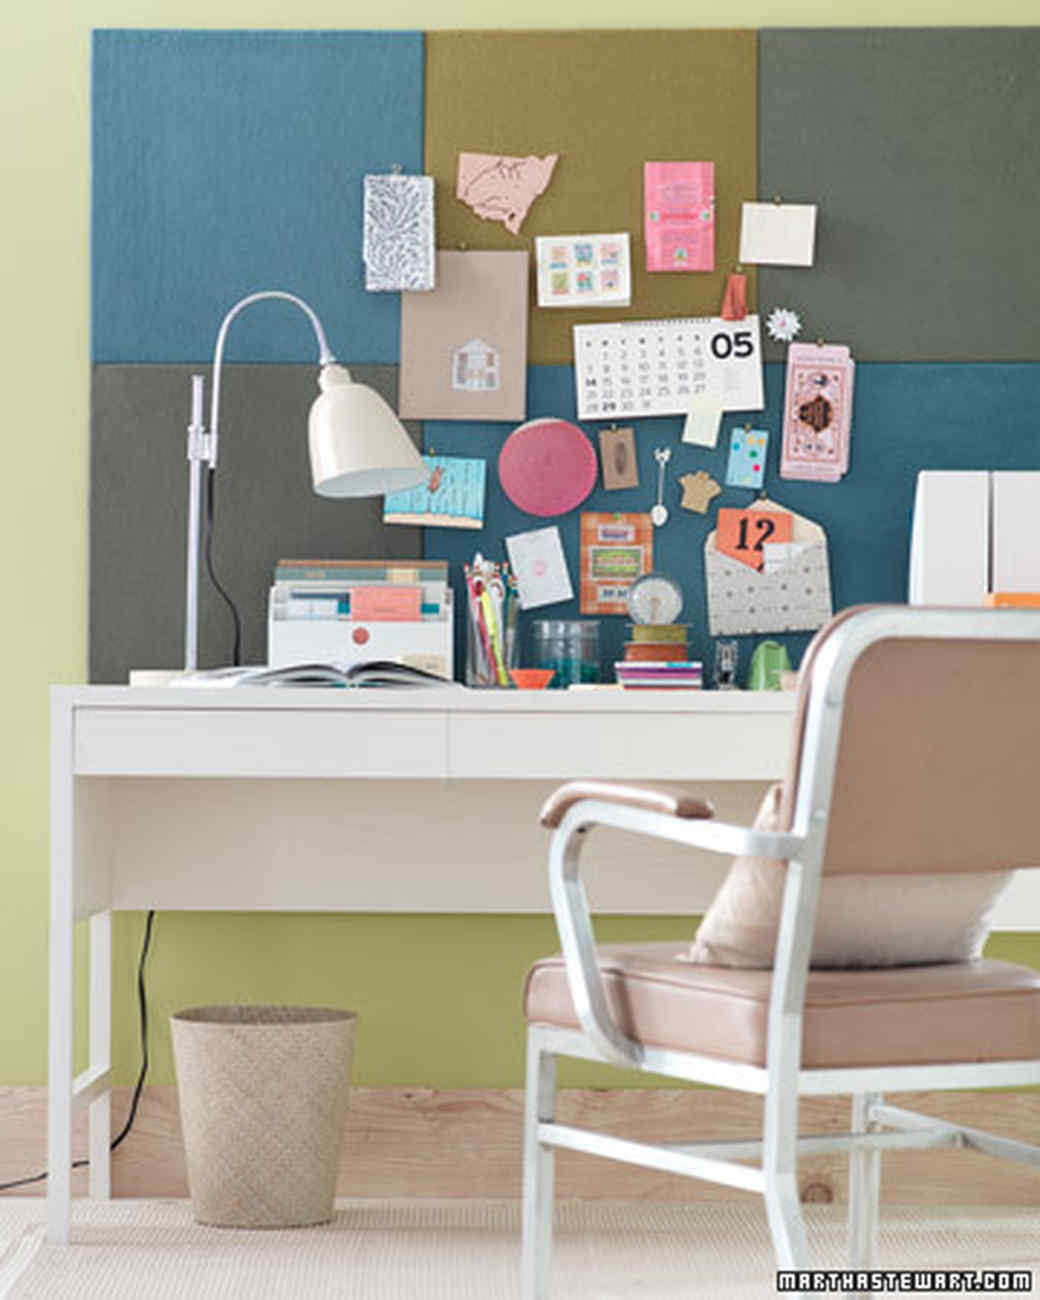 Home office desk organization Organizing Live Better Lifestyle Desk Organizing Ideas Martha Stewart